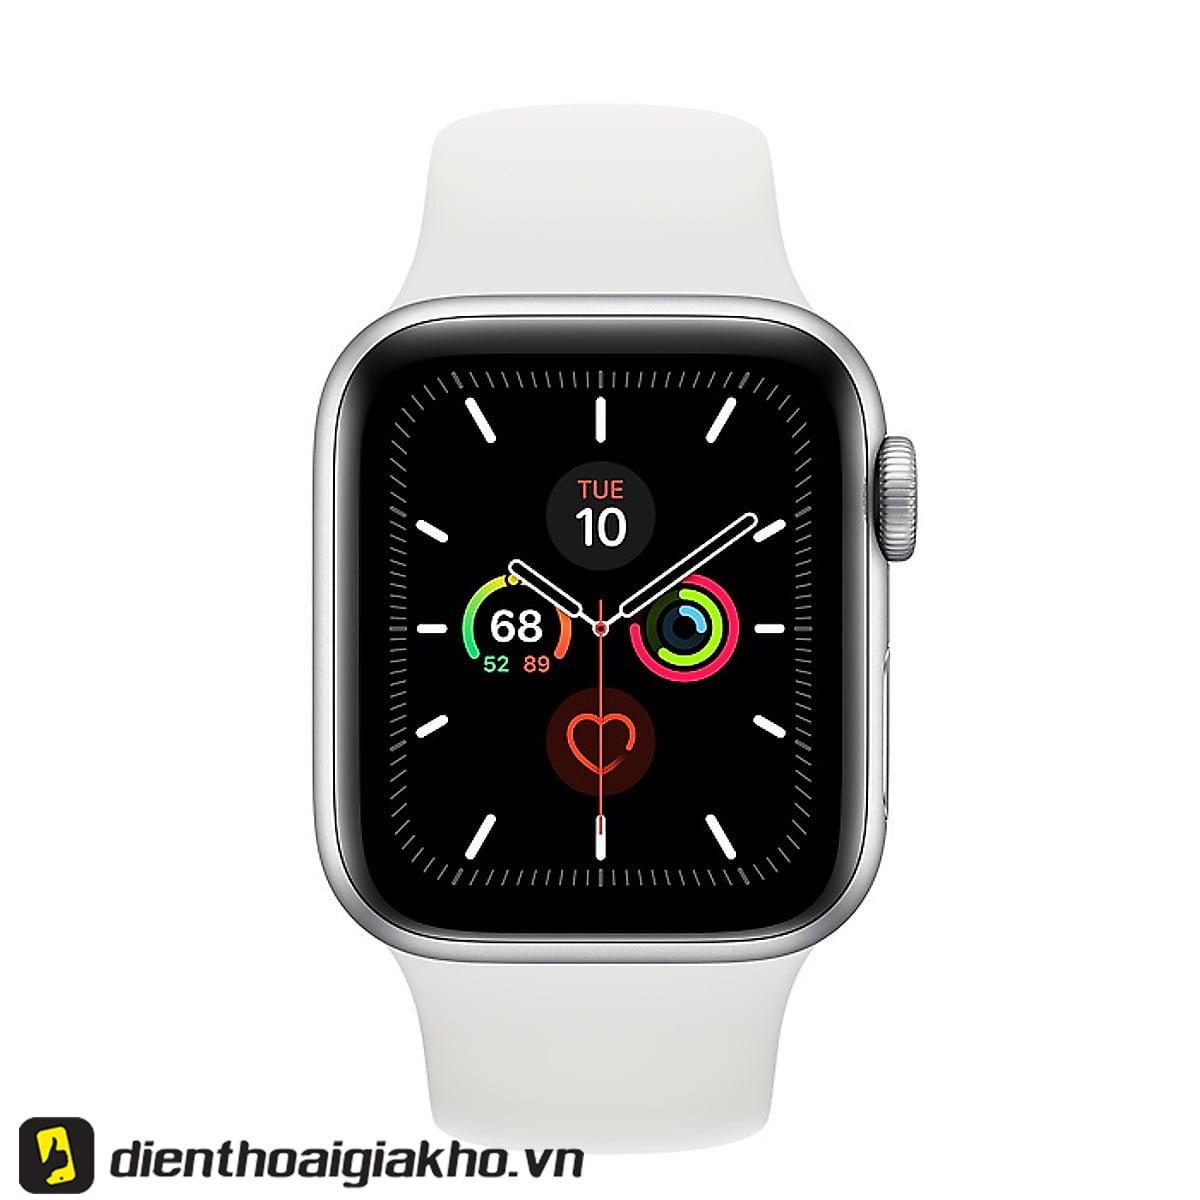 Apple Watch SE 40mm GPS Aluminum Cũ màn hình sắc nét